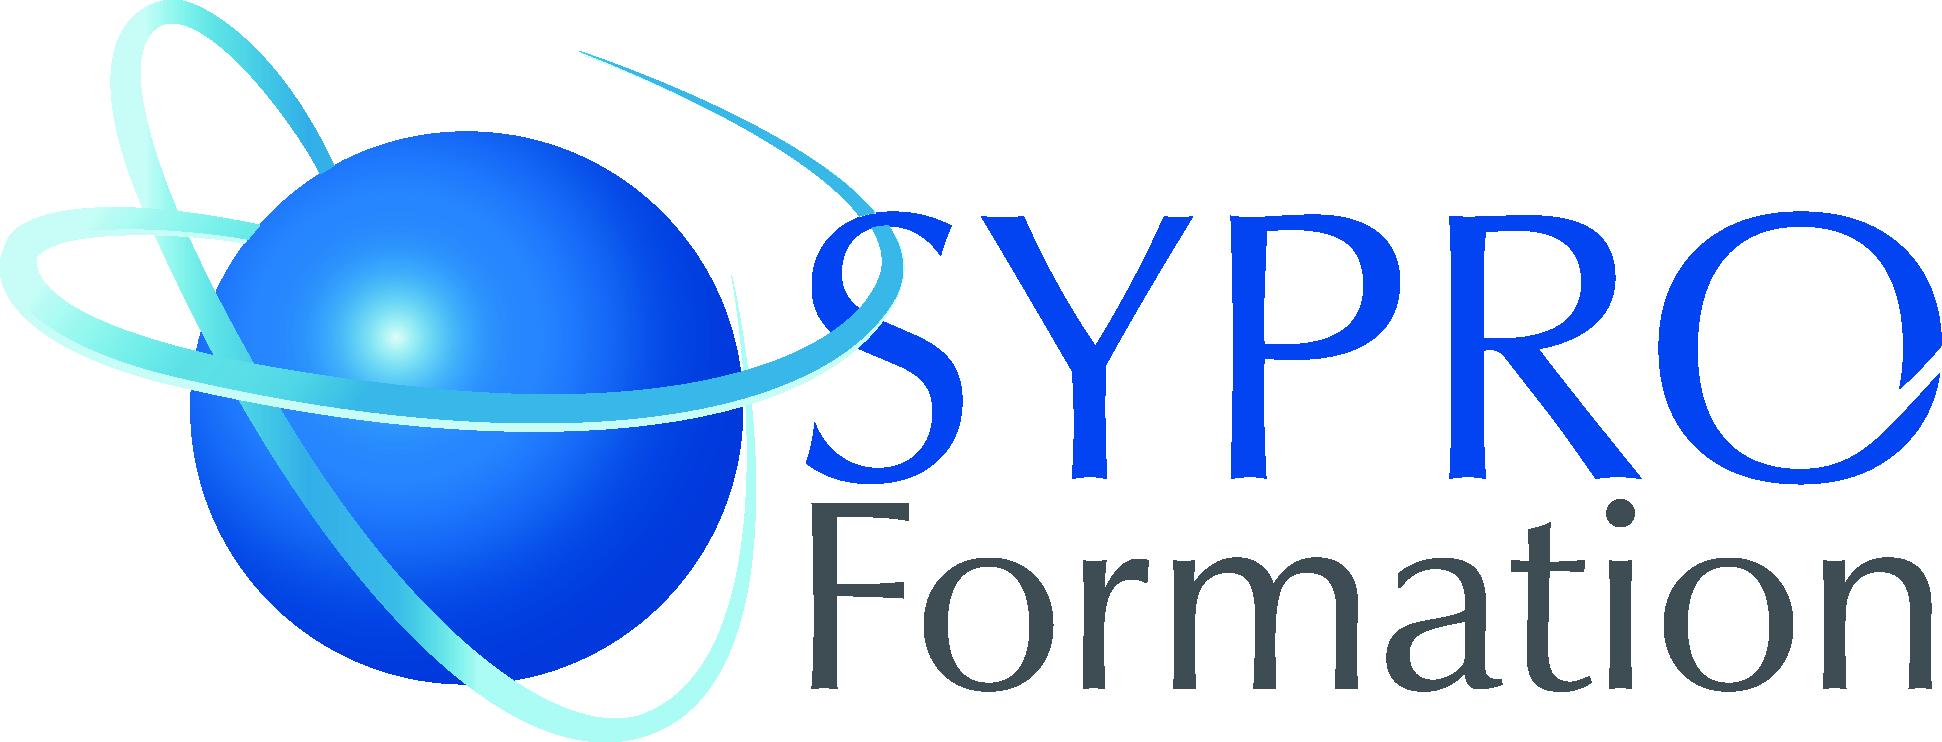 SYPRO FORMATION